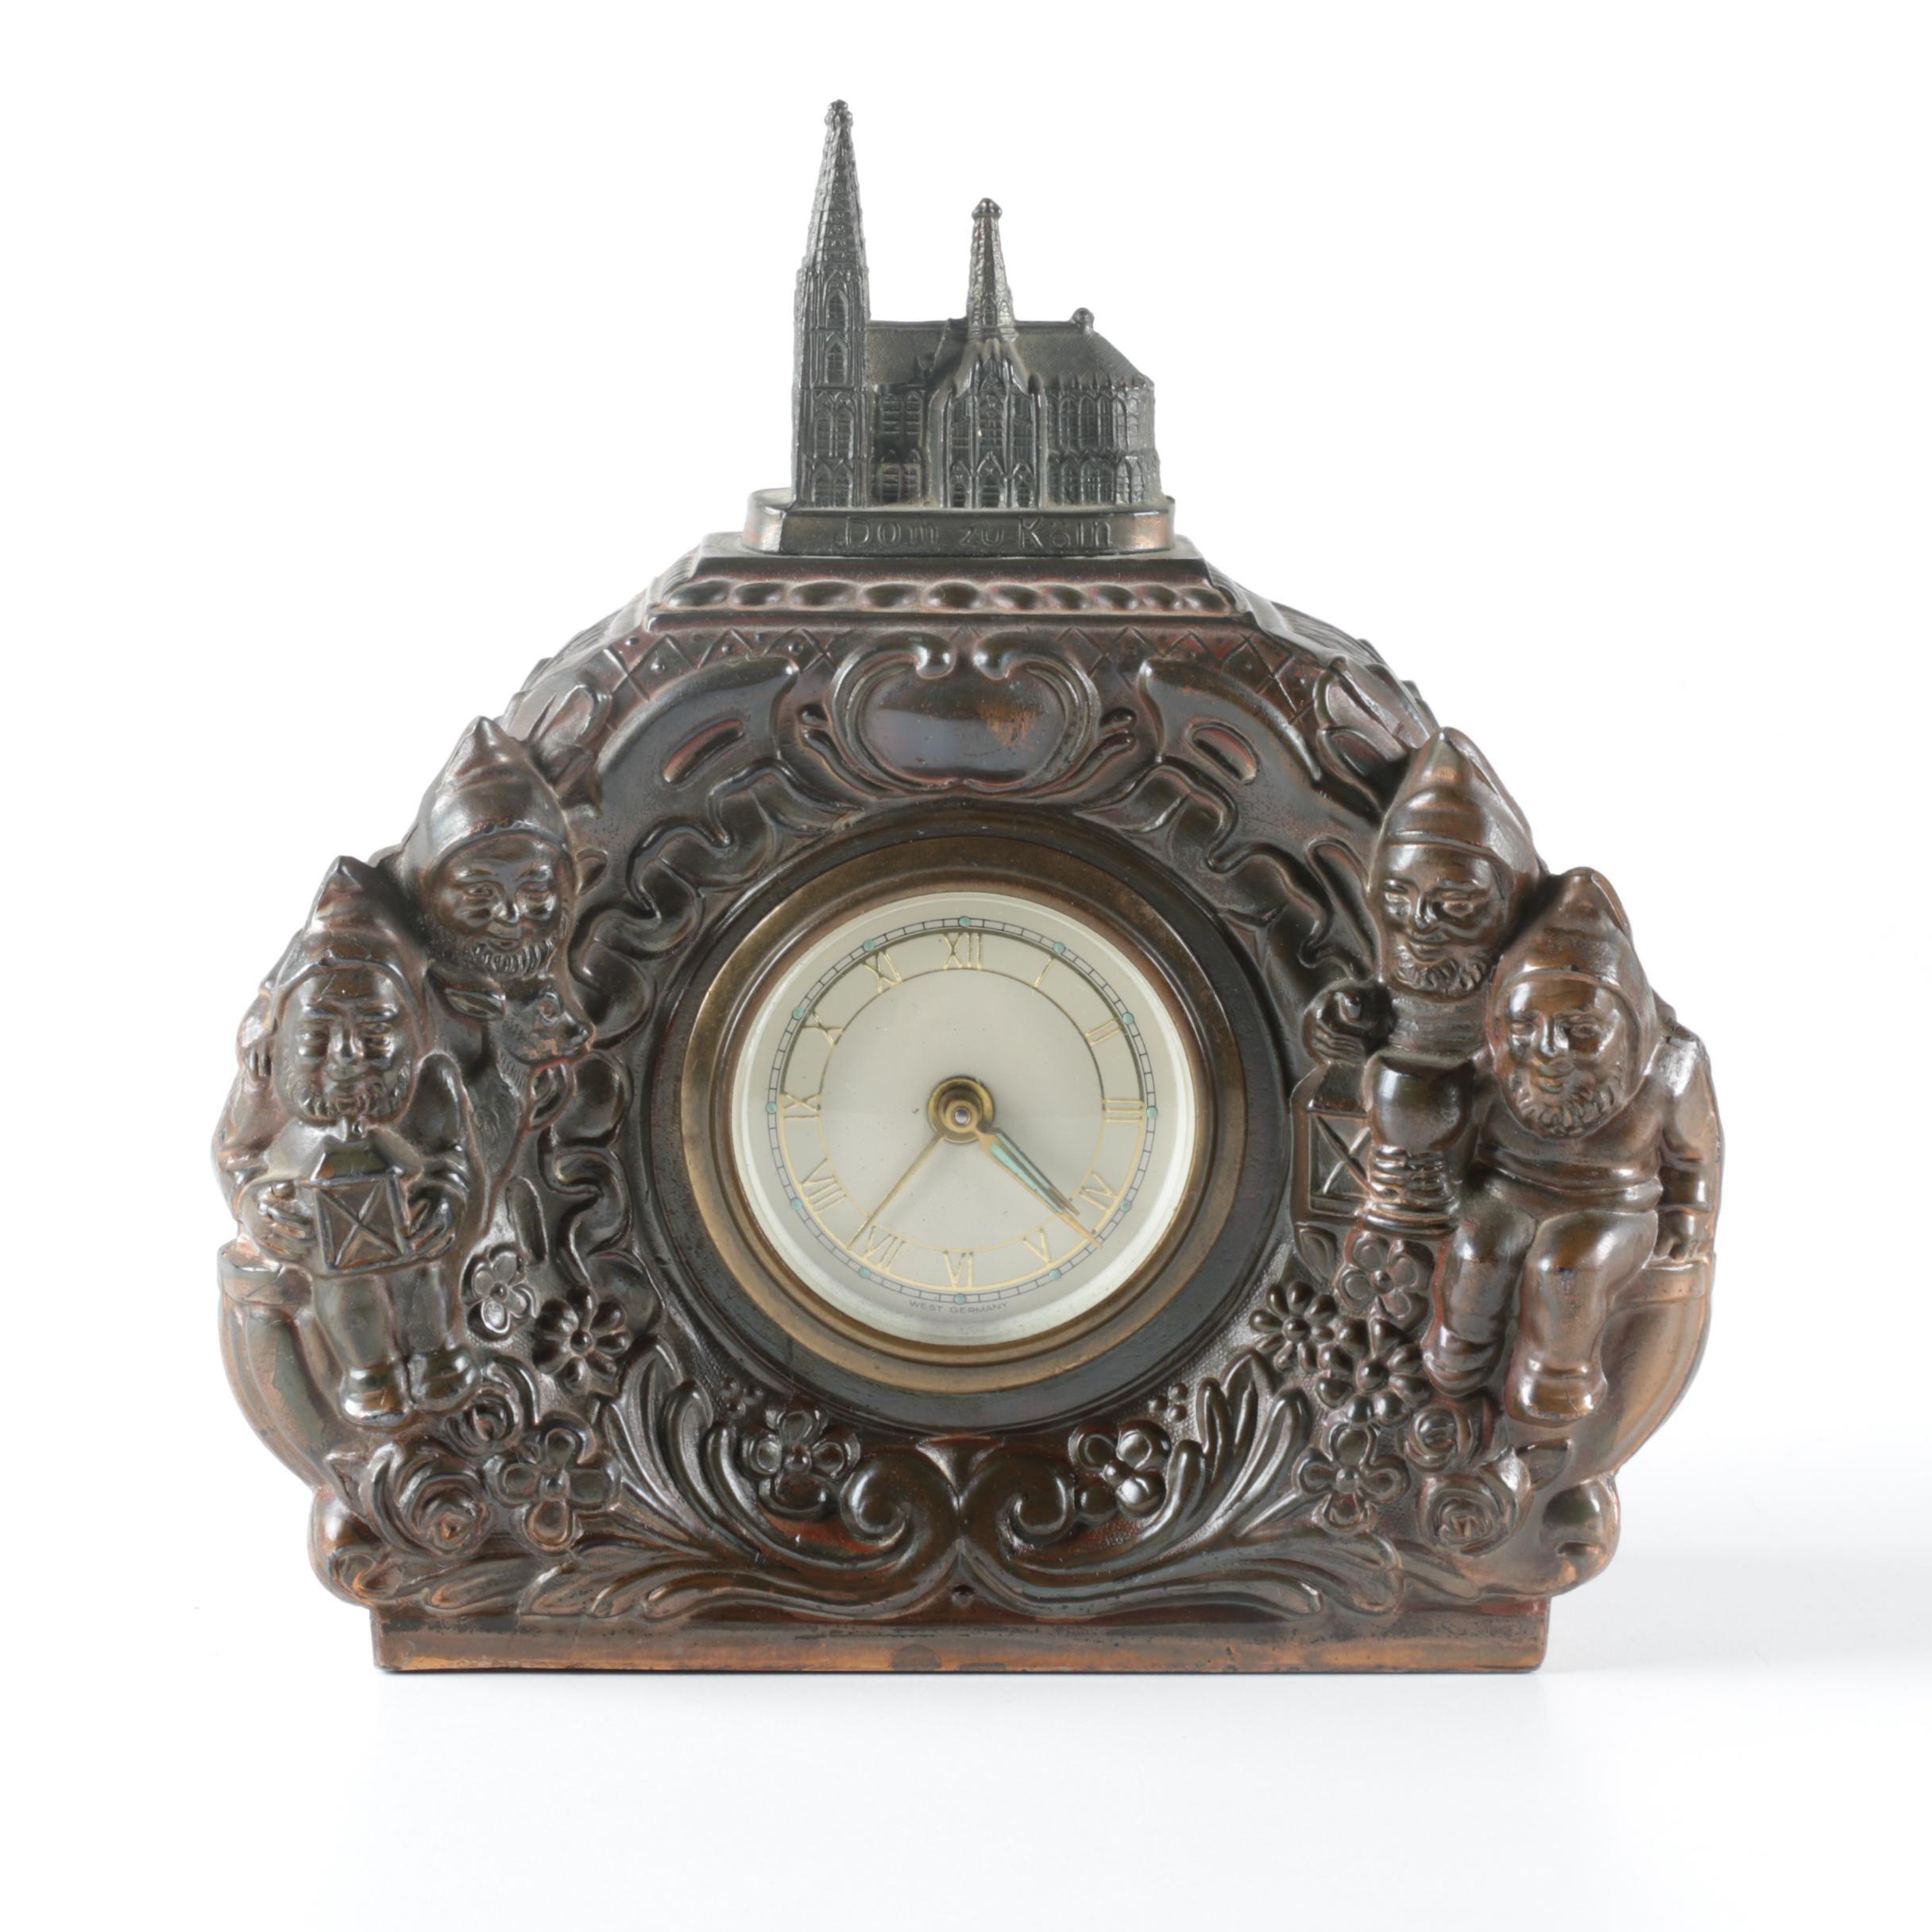 Vintage Gnome Ges Gesch German Novelty Clock